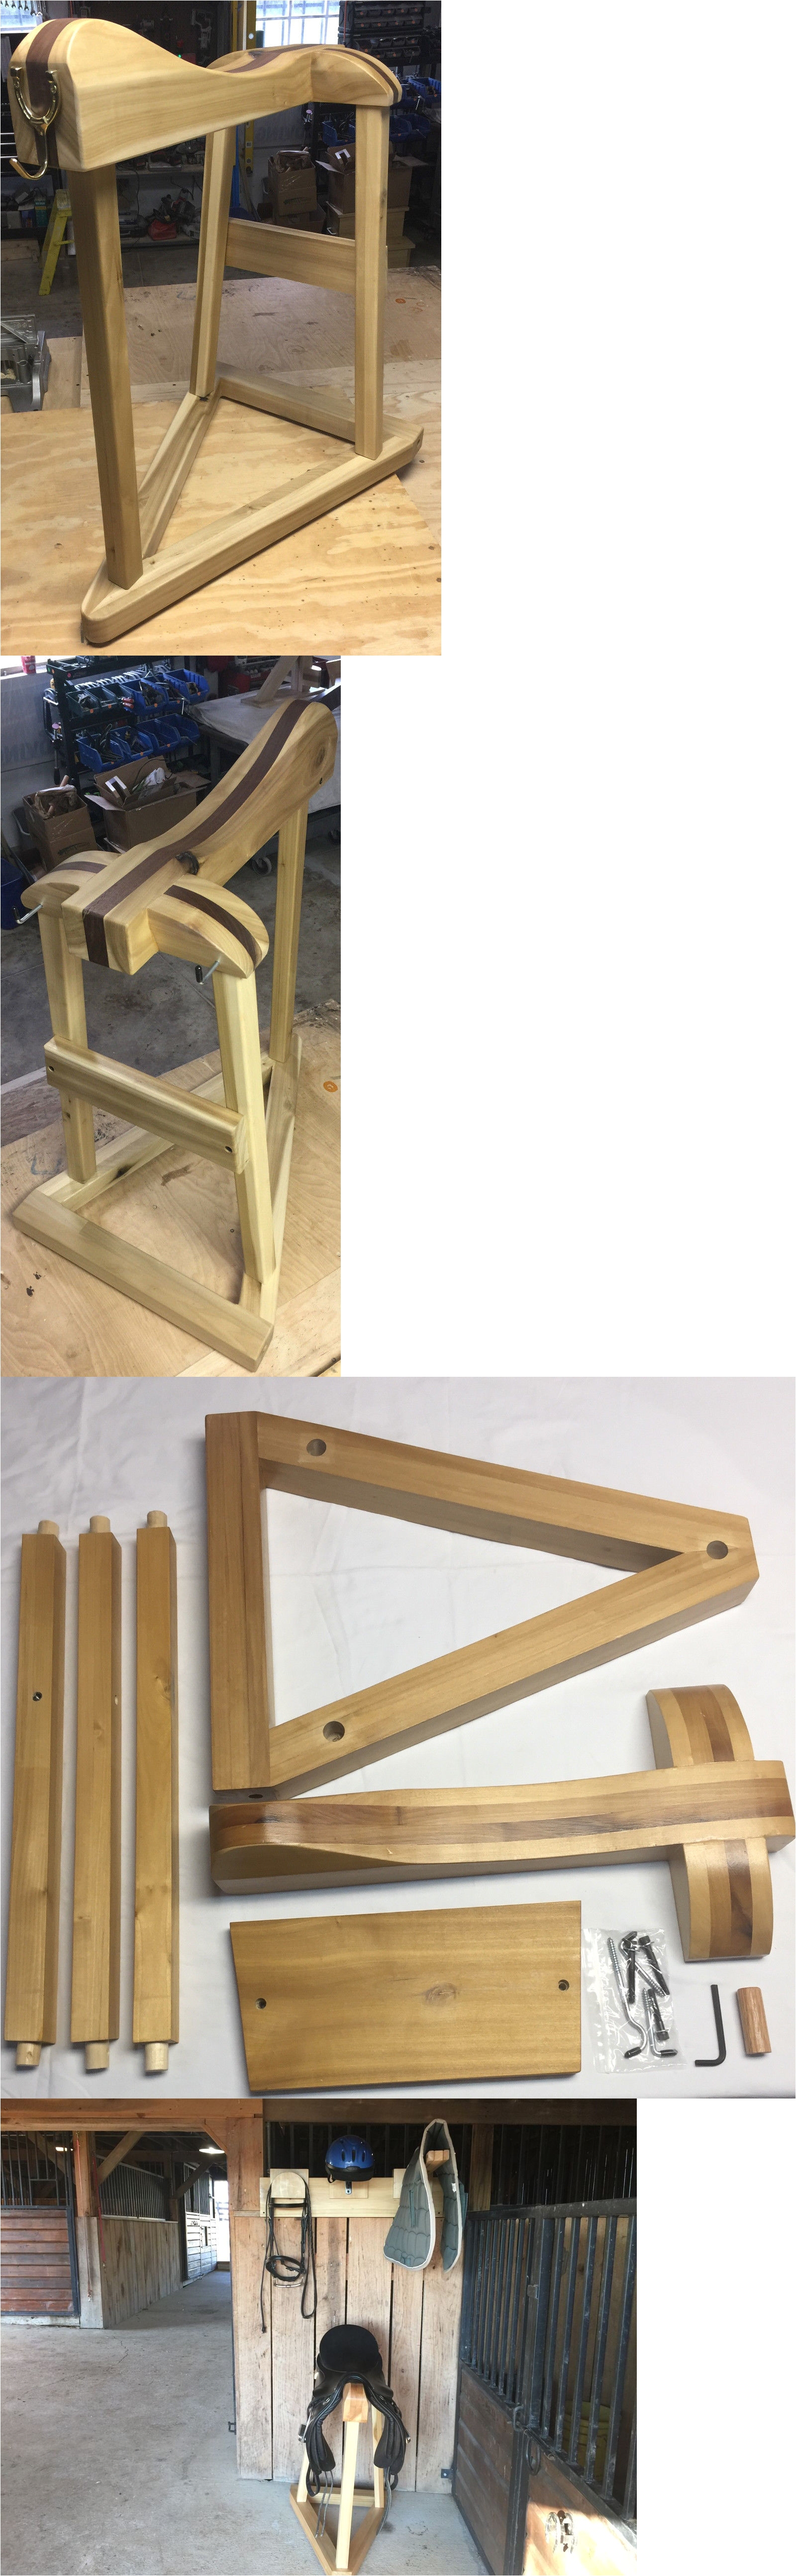 Collapsible Wood Saddle Rack Saddle Racks and Stands 183432 Wud Saddleraxa Standard Saddle Rack